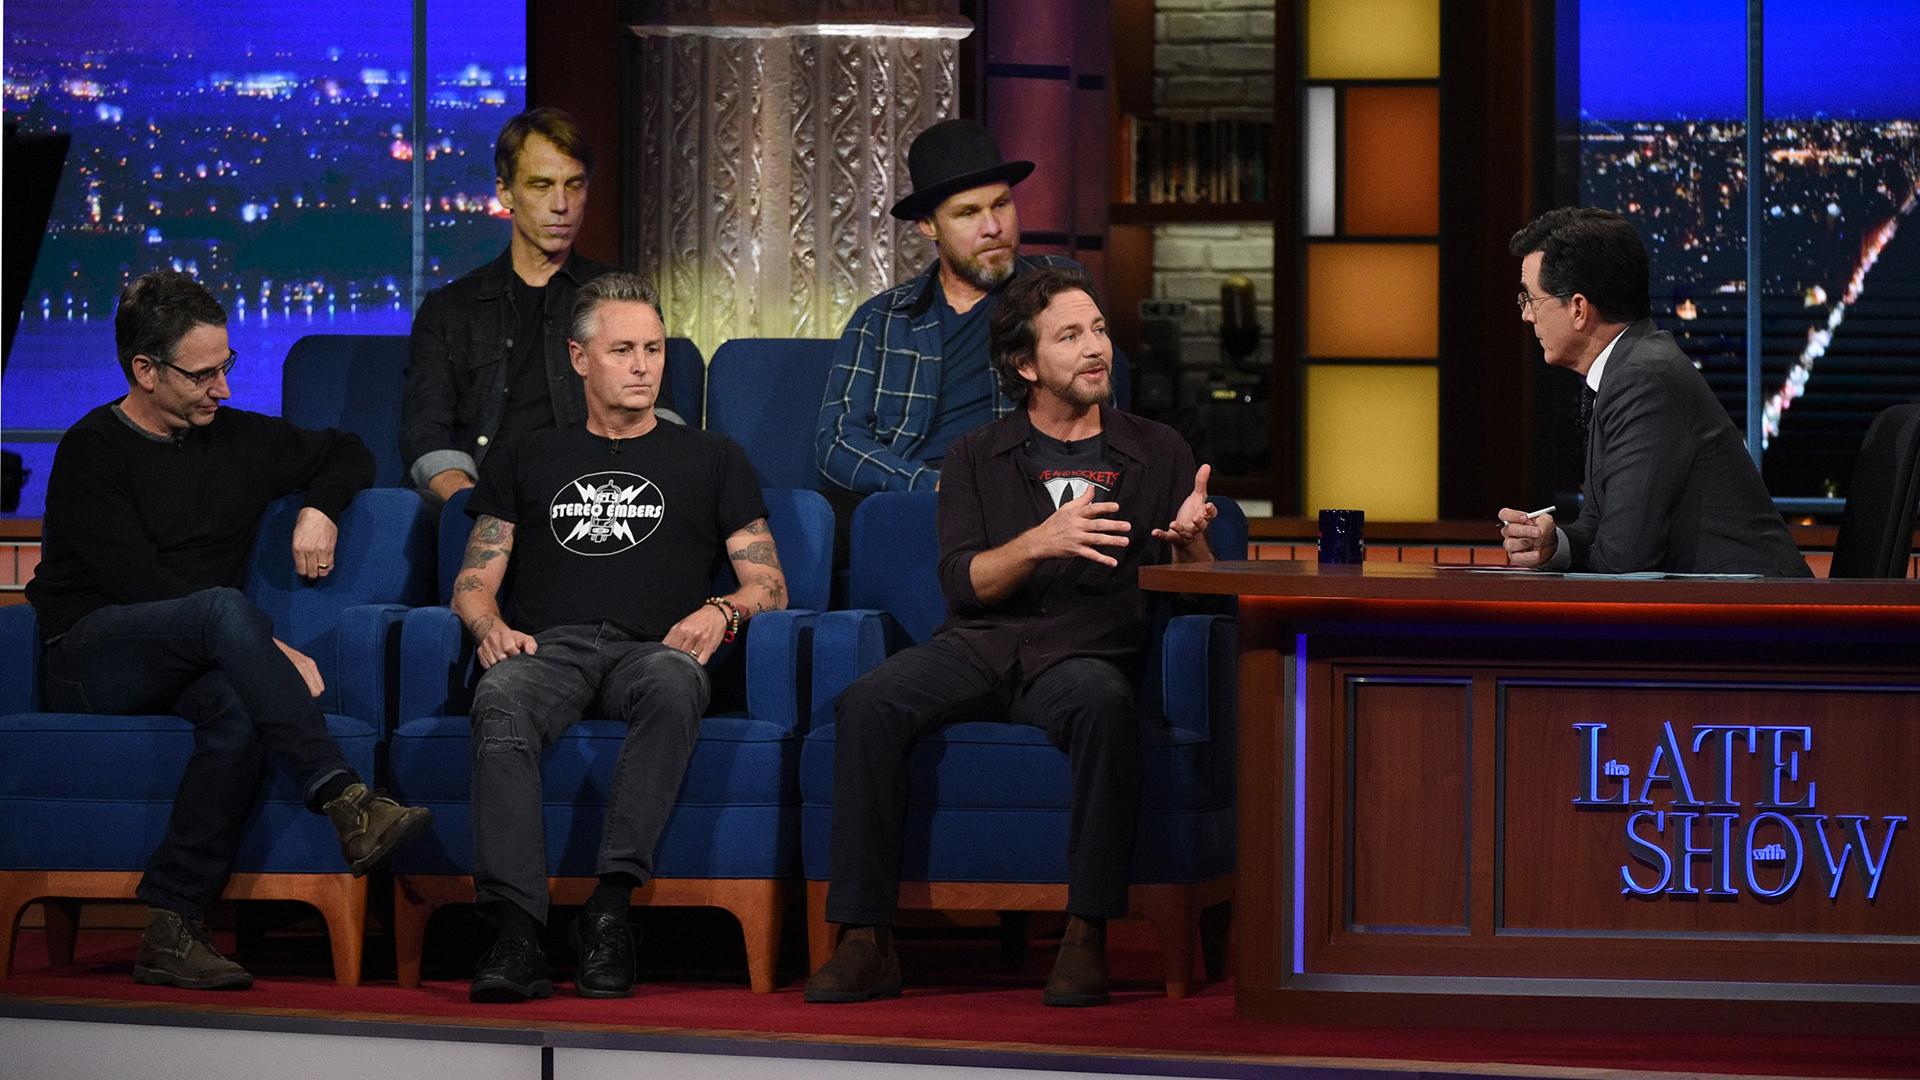 Pearl Jam and Stephen Colbert